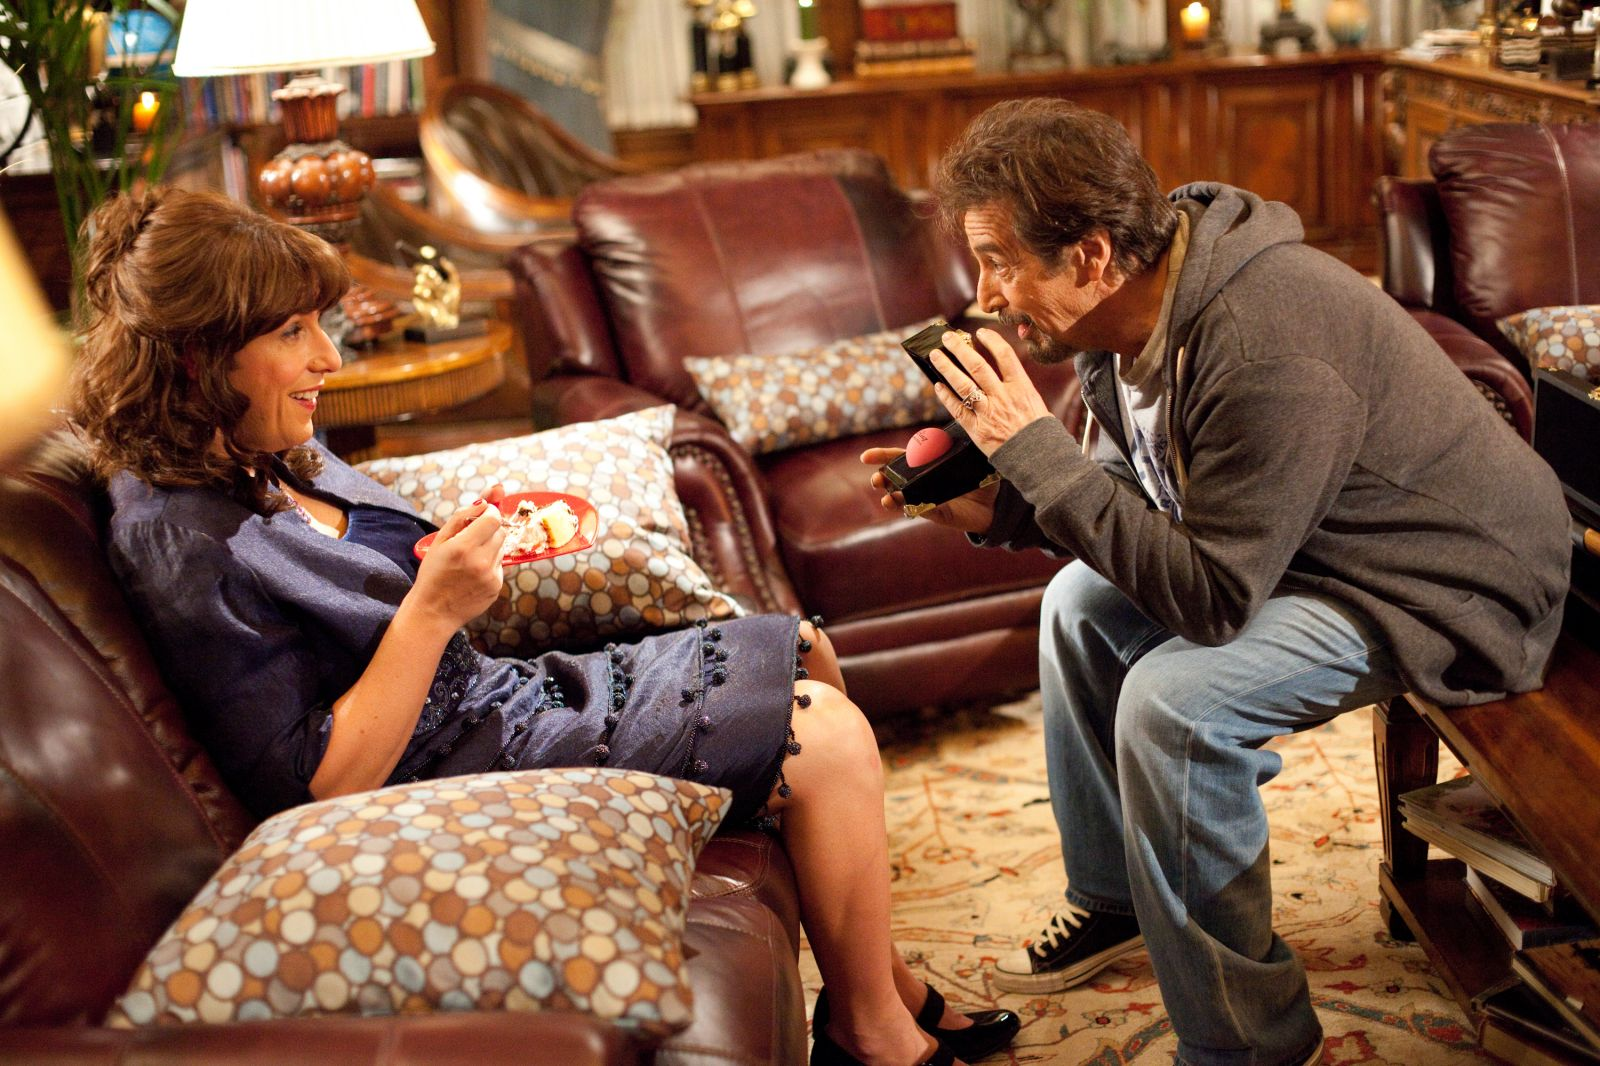 Al Pacino Pokes Fun At Himself In Jack And Jill Movie